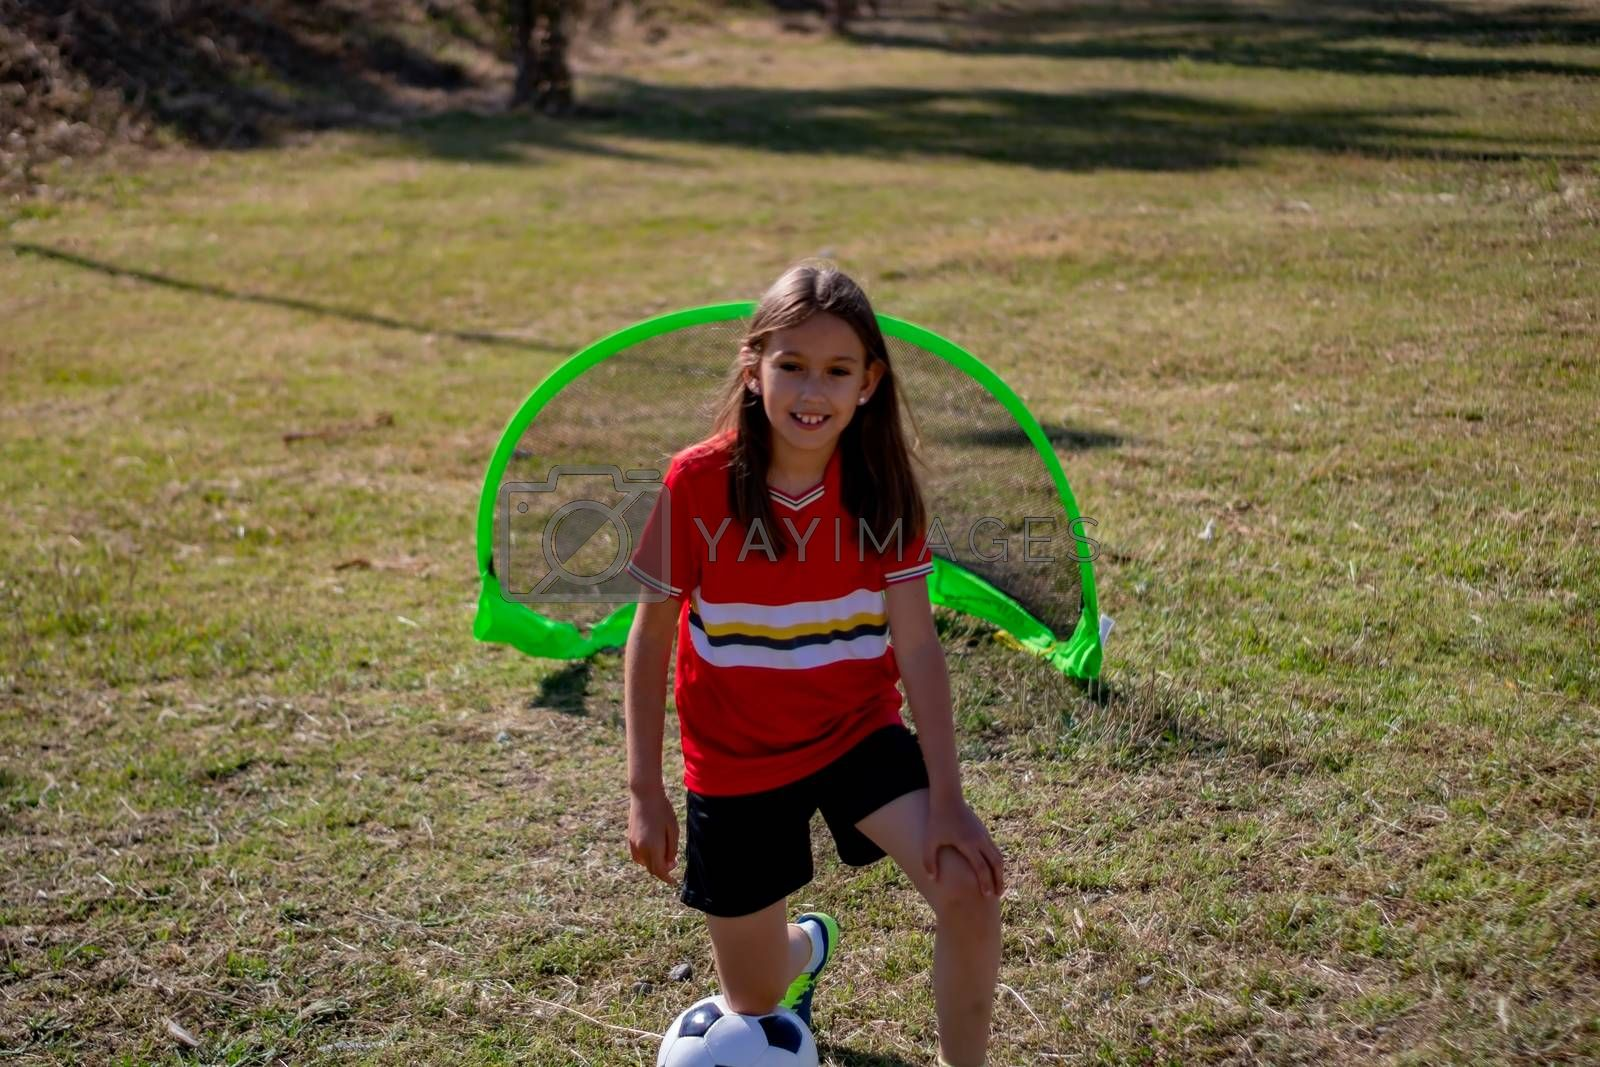 Little girl playing soccer on grassy esplanade